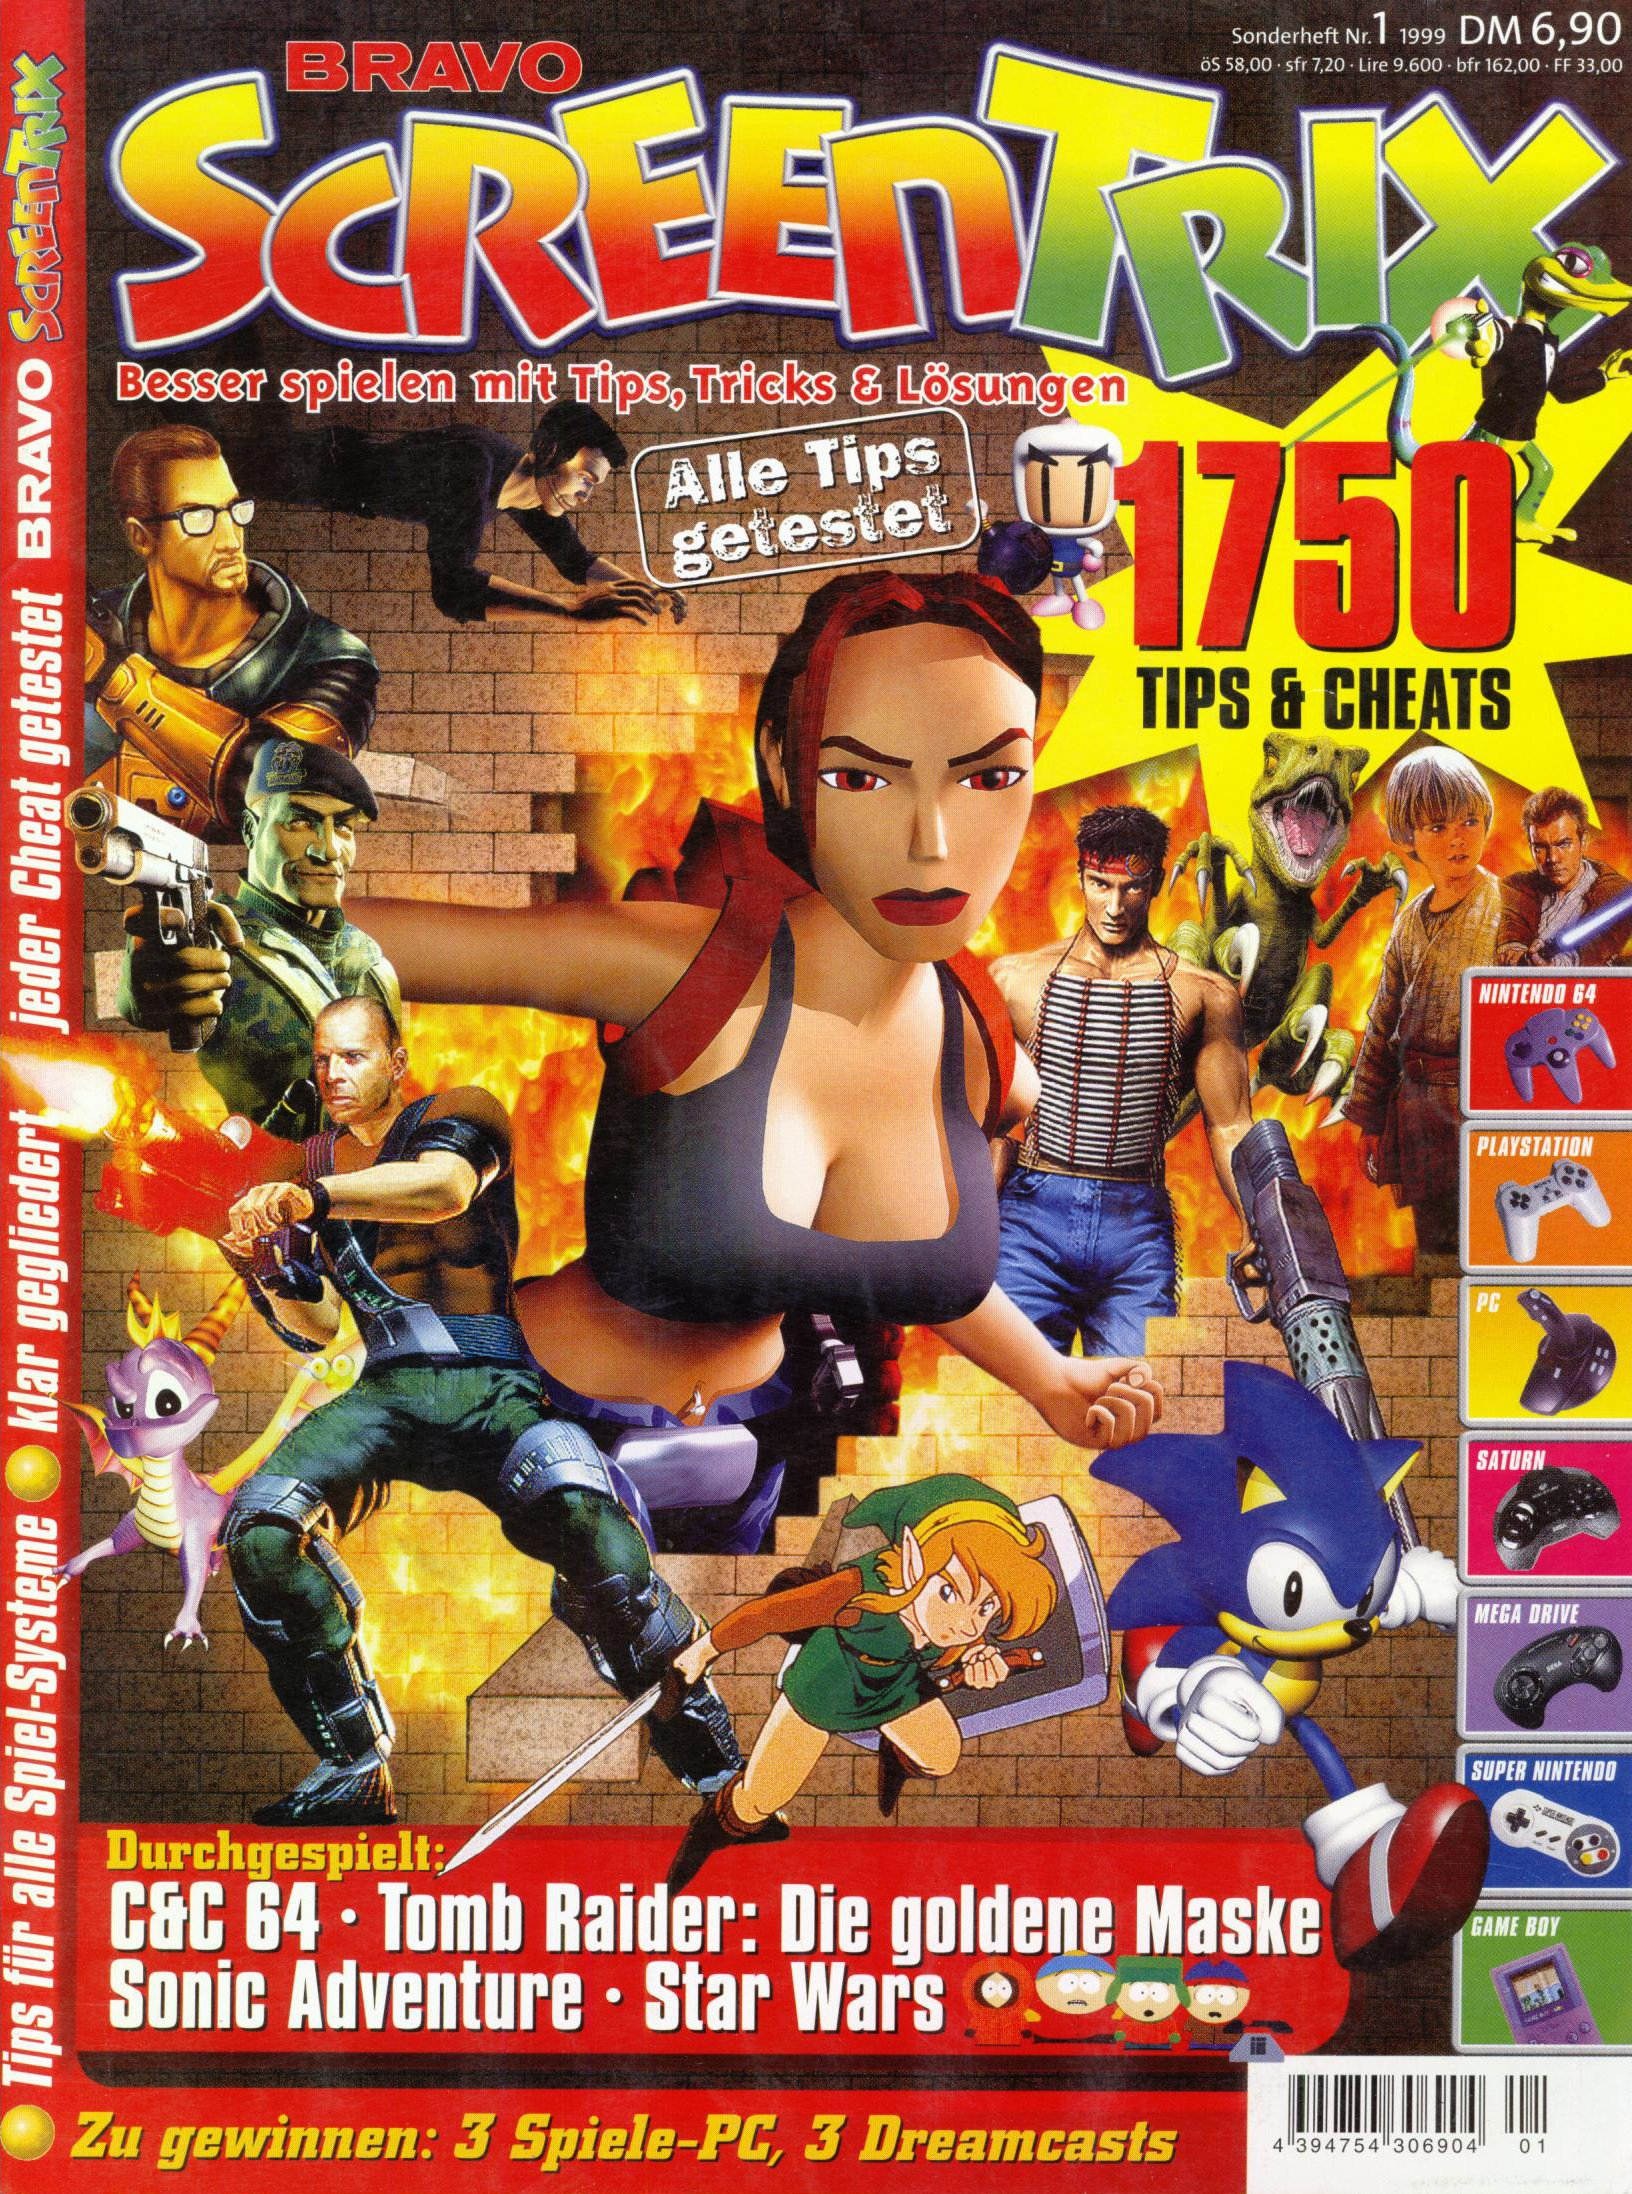 Bravo ScreenTRIX 1999 Special Issue 01